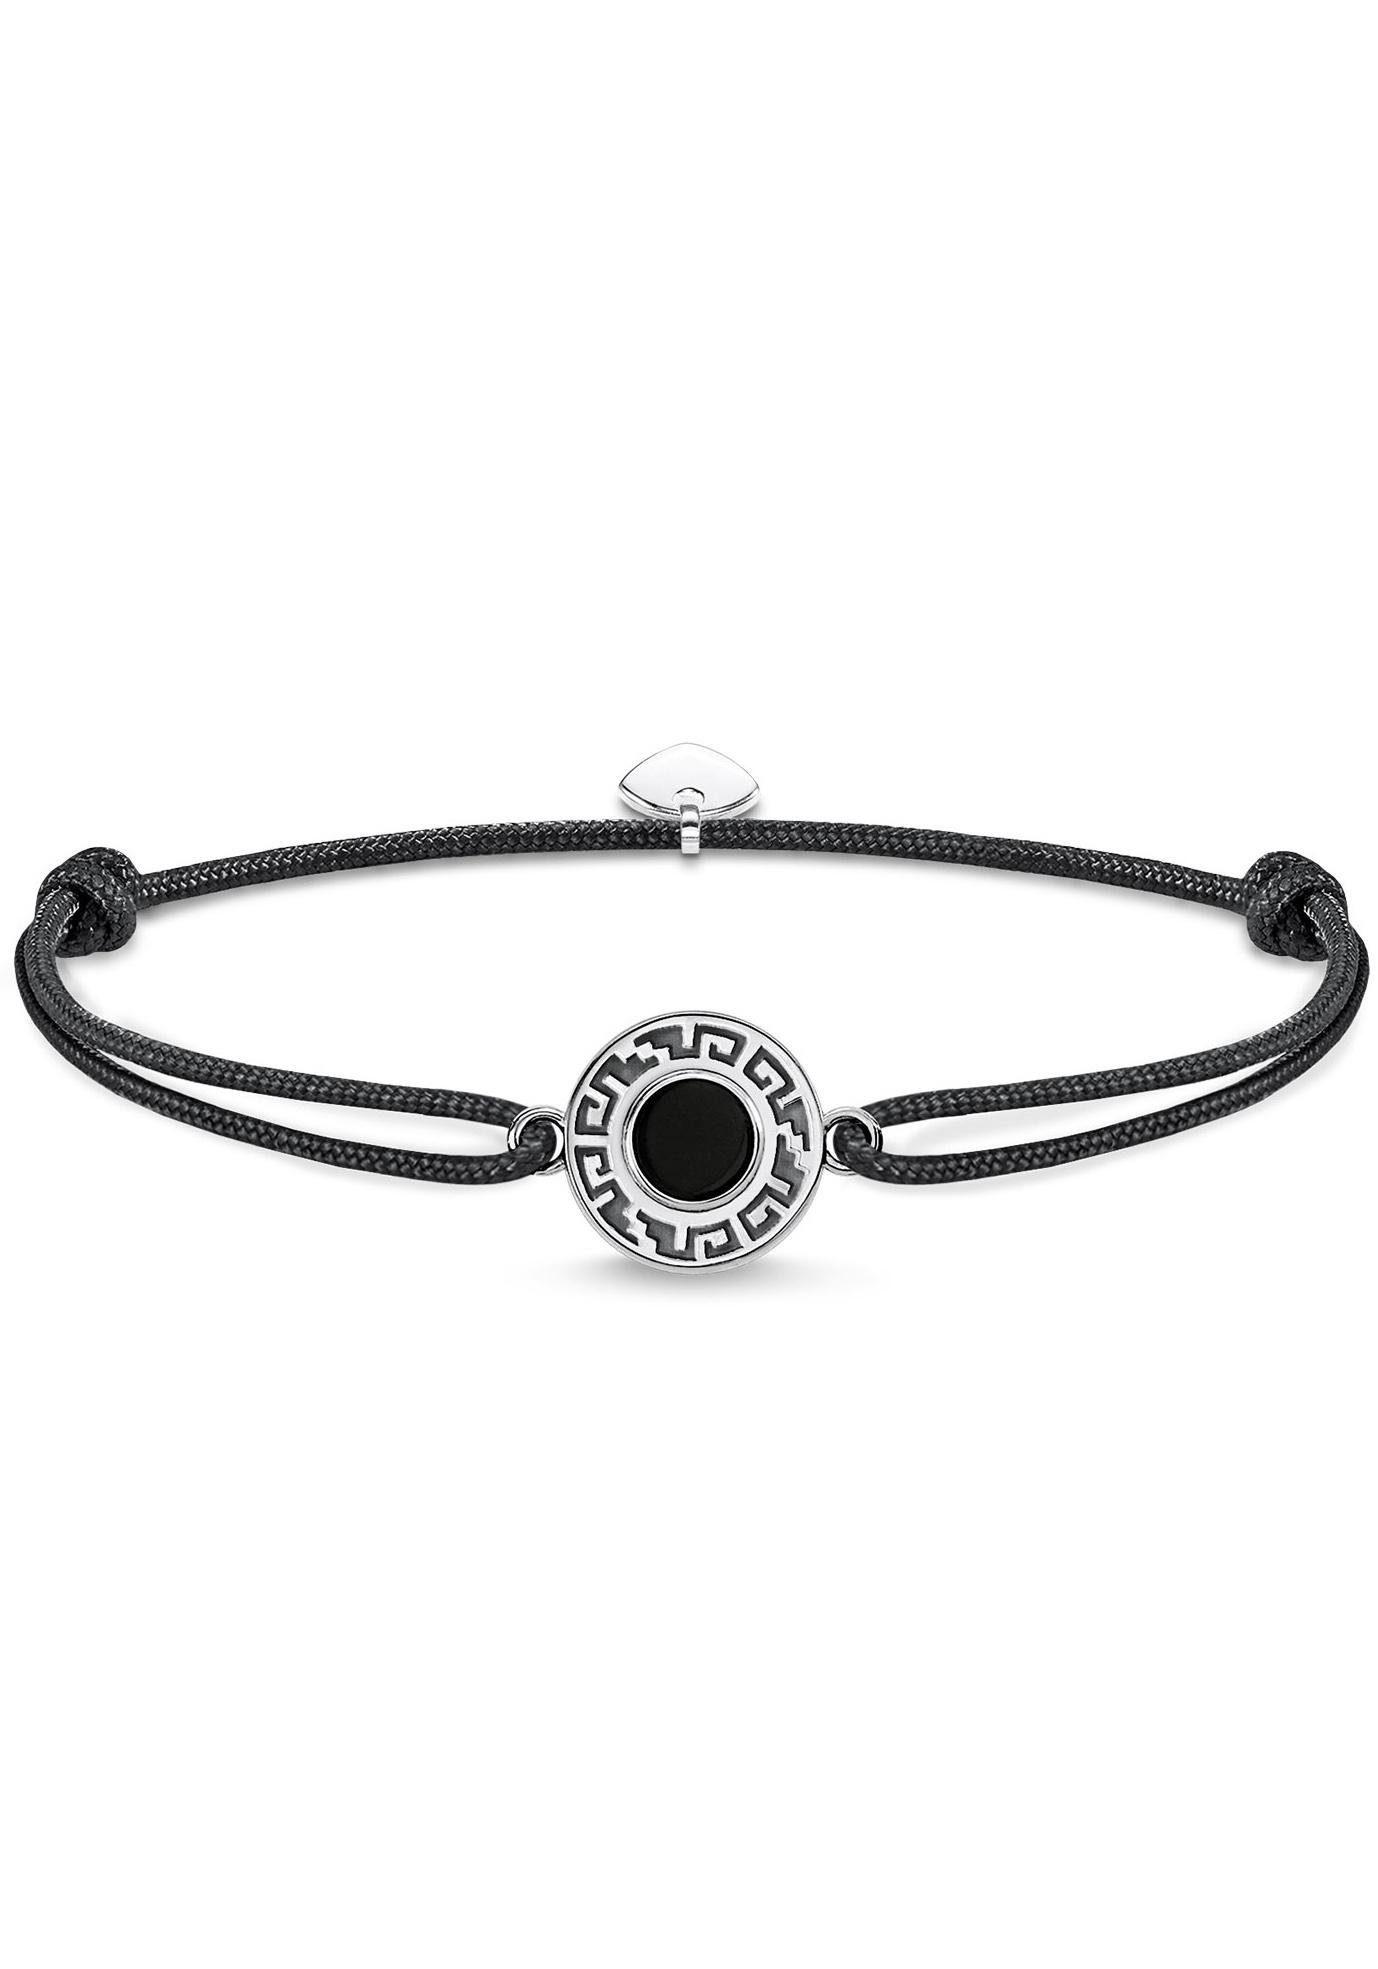 THOMAS SABO Armband »Little Secret Ornament Schwarz, LS060-505-11-L22v« mit Achat